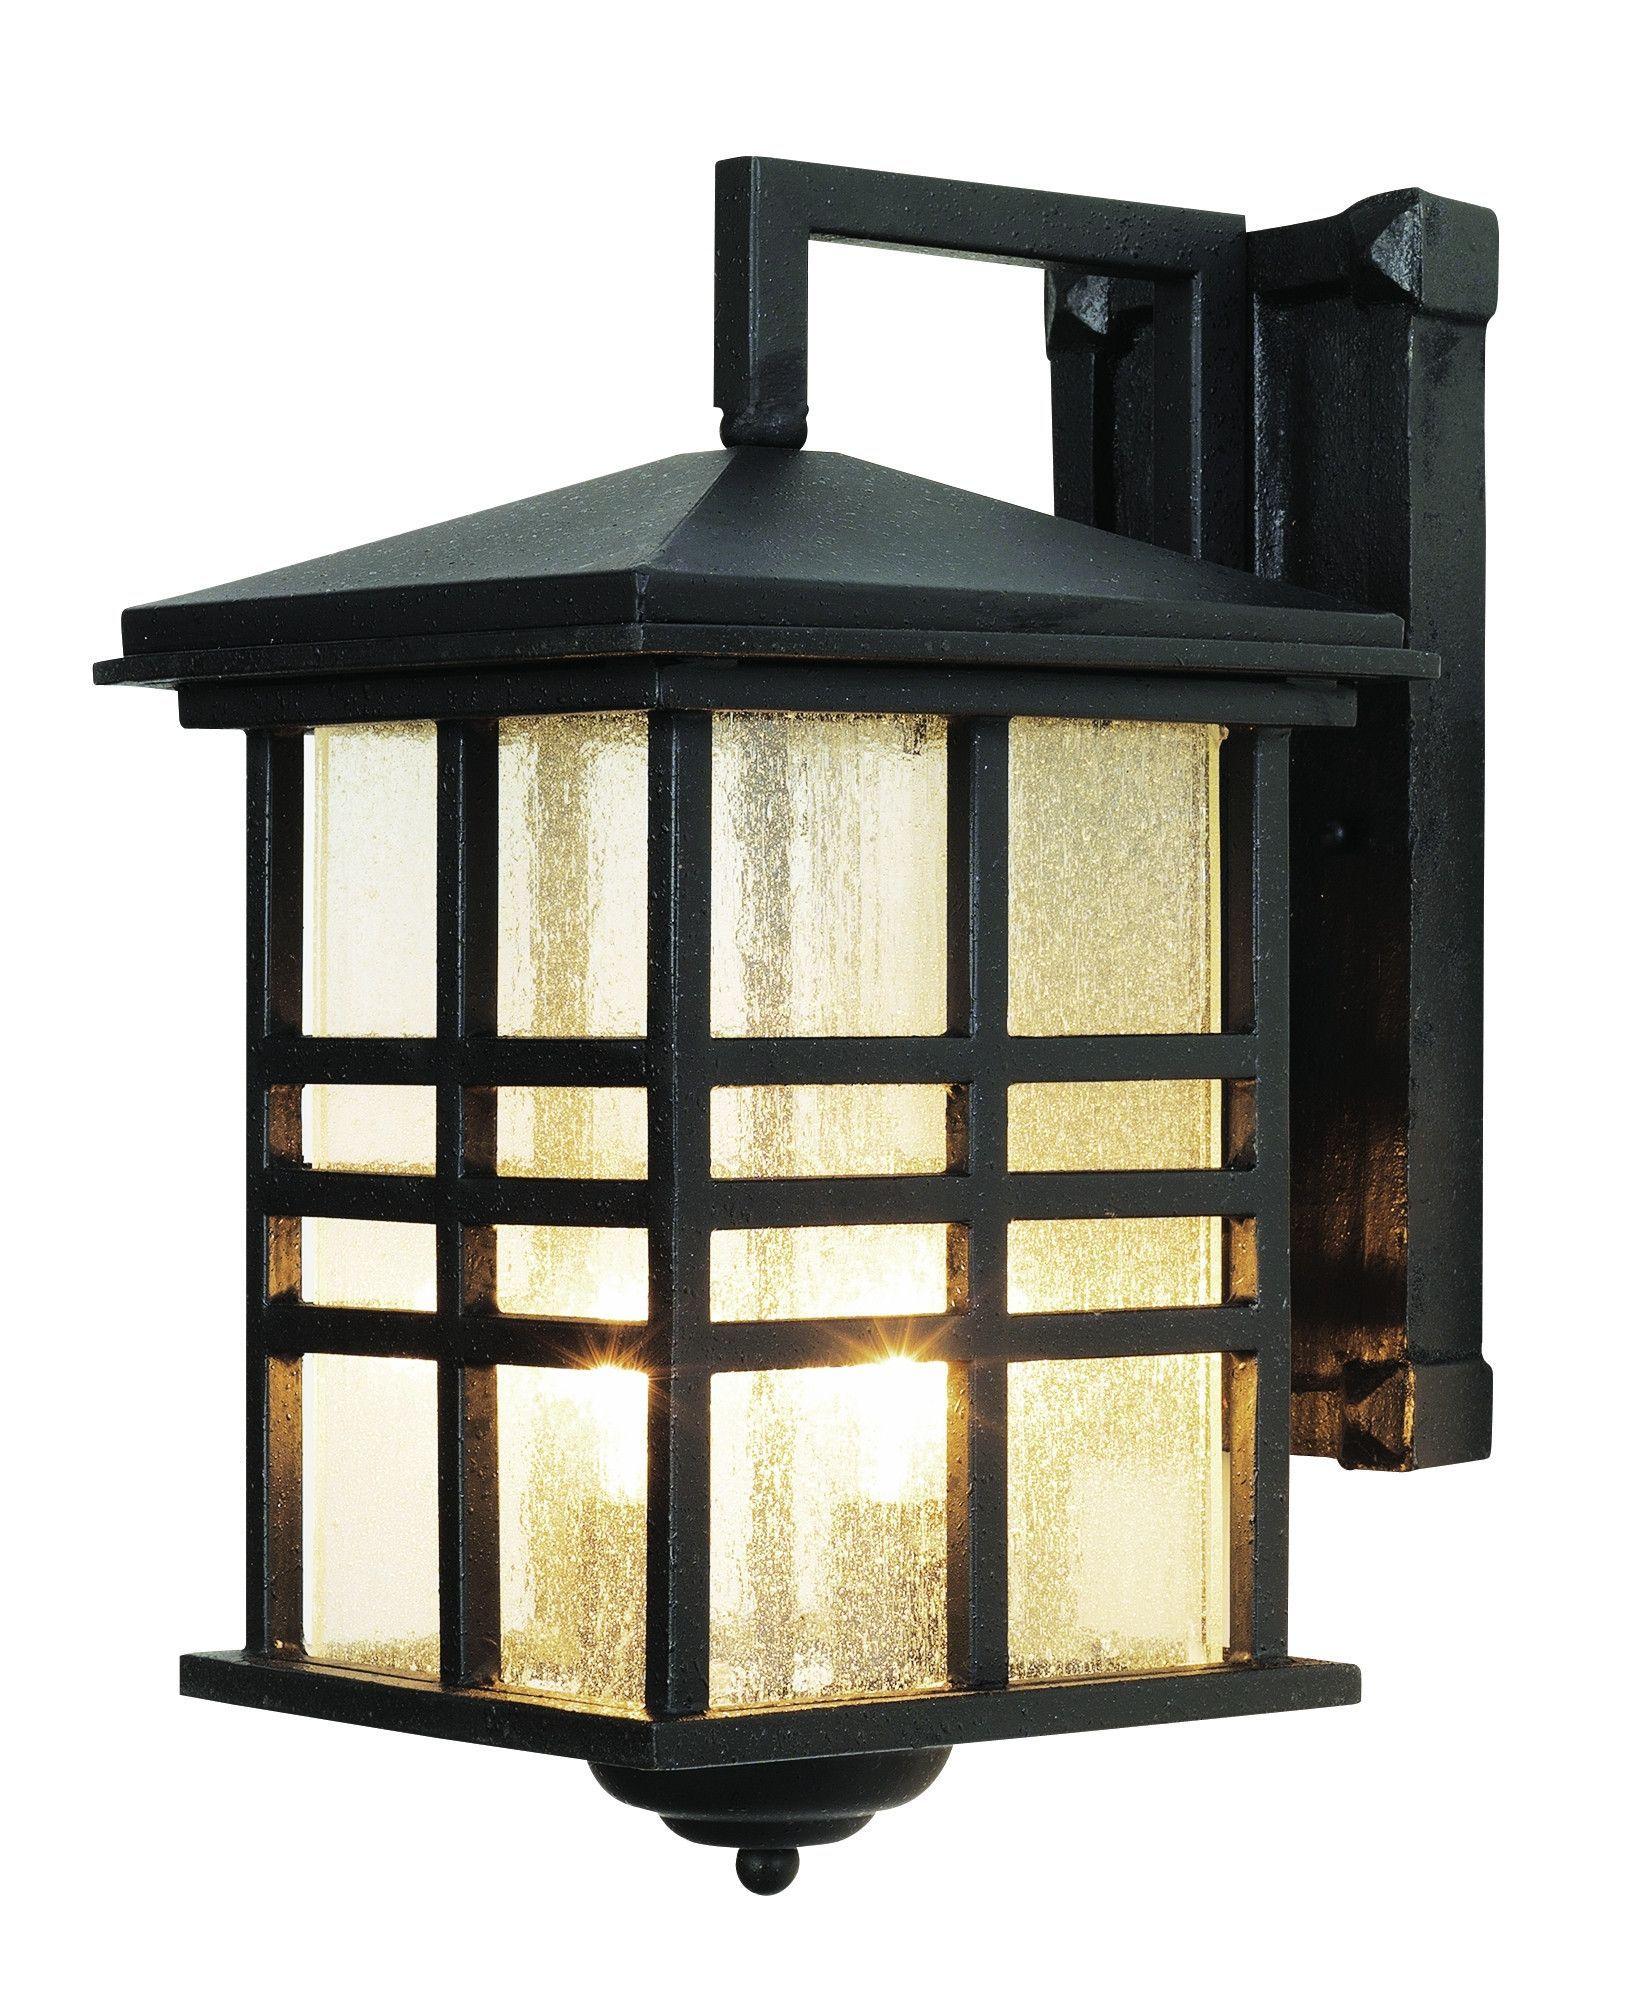 Trans Globe Lighting 4636 Bk Craftsman 13 Outdoor Wall Light Black Outdoor Wall Lantern Wall Lantern Black Outdoor Wall Lights